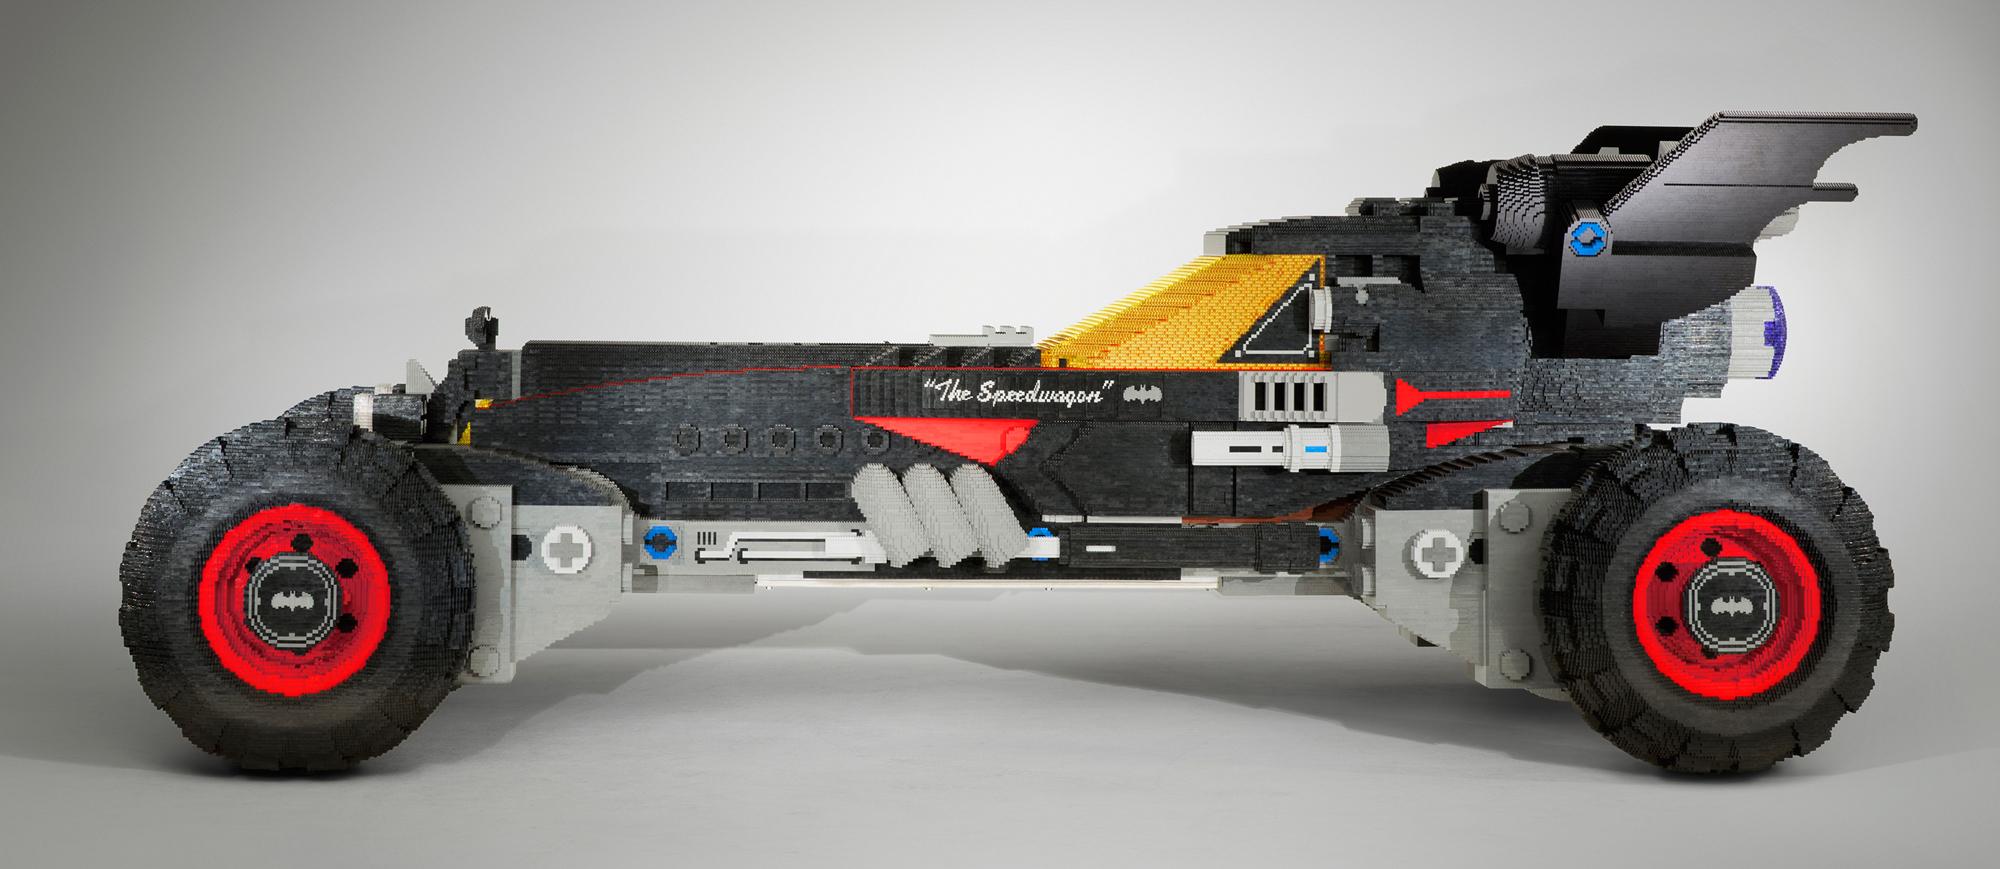 LEGO bm 3.jpg